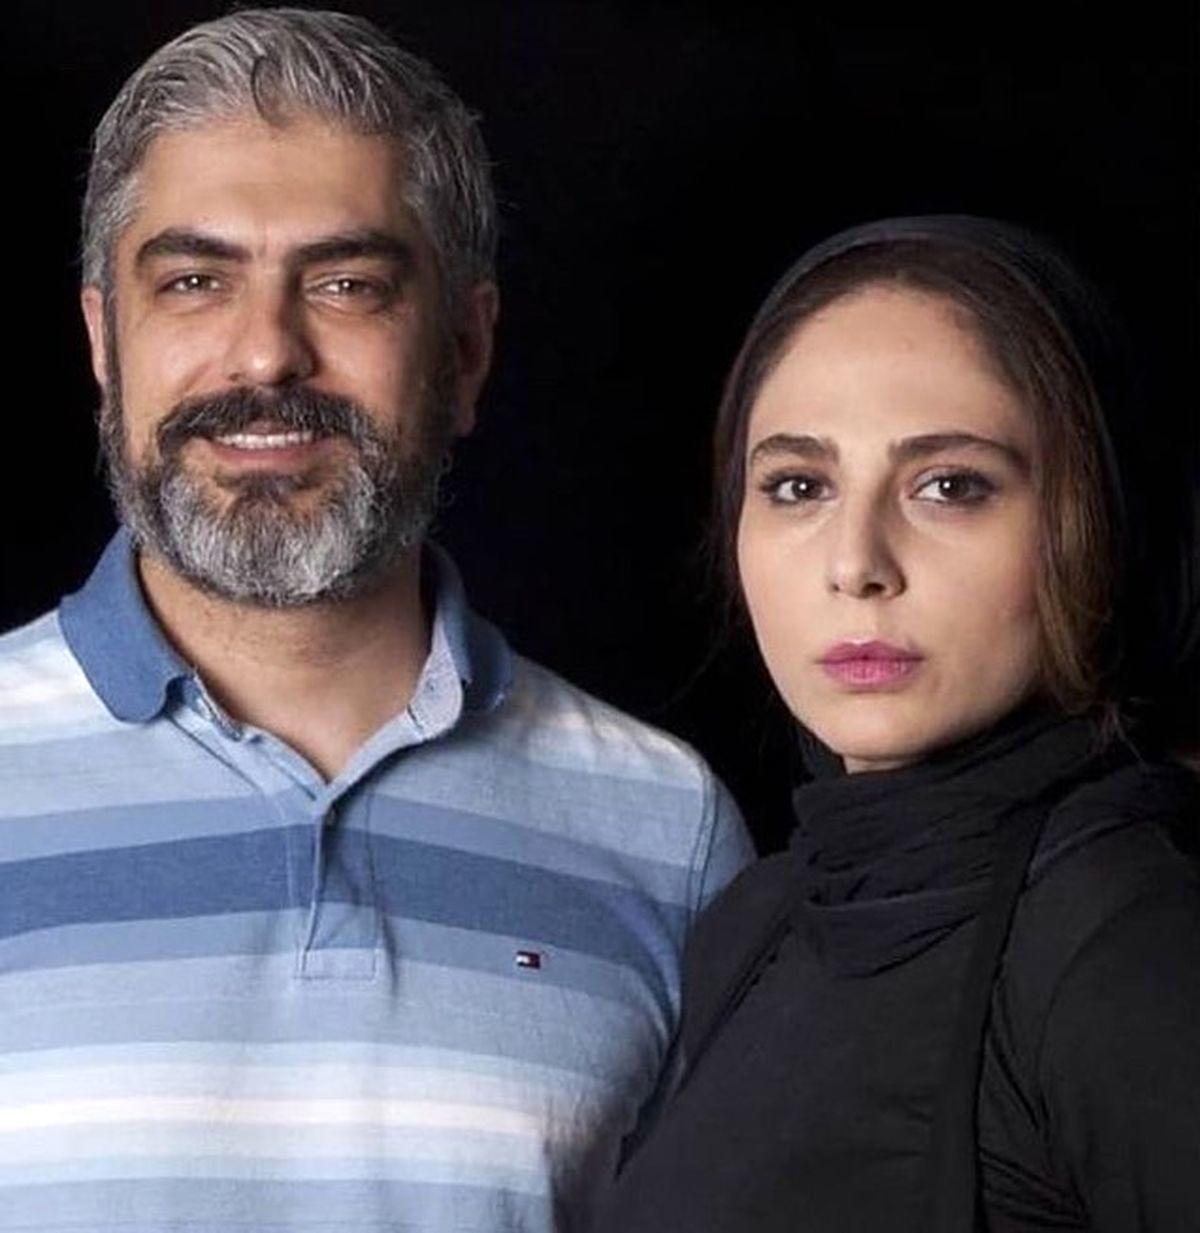 عکس جدید مهدی پاکدل و و همسرش + تصاویر عاشقانه